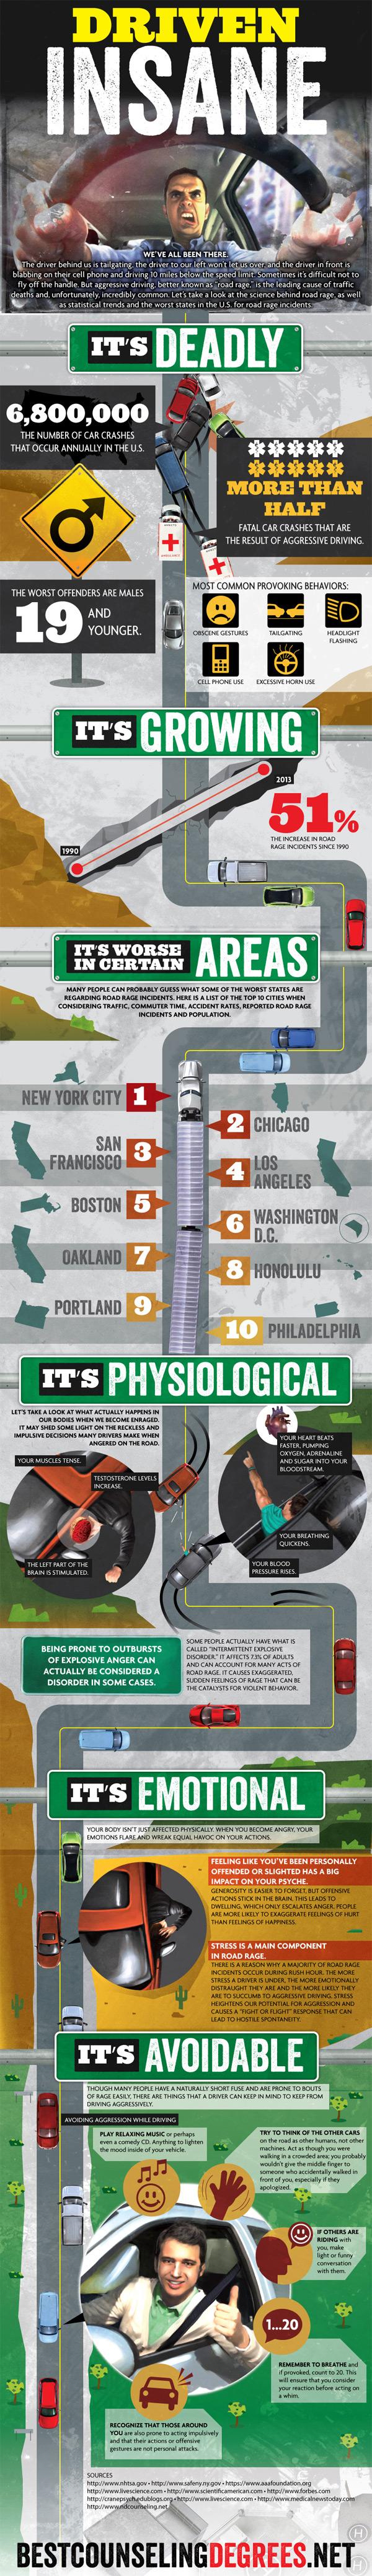 Aggressive Driving Statistics-Infographic